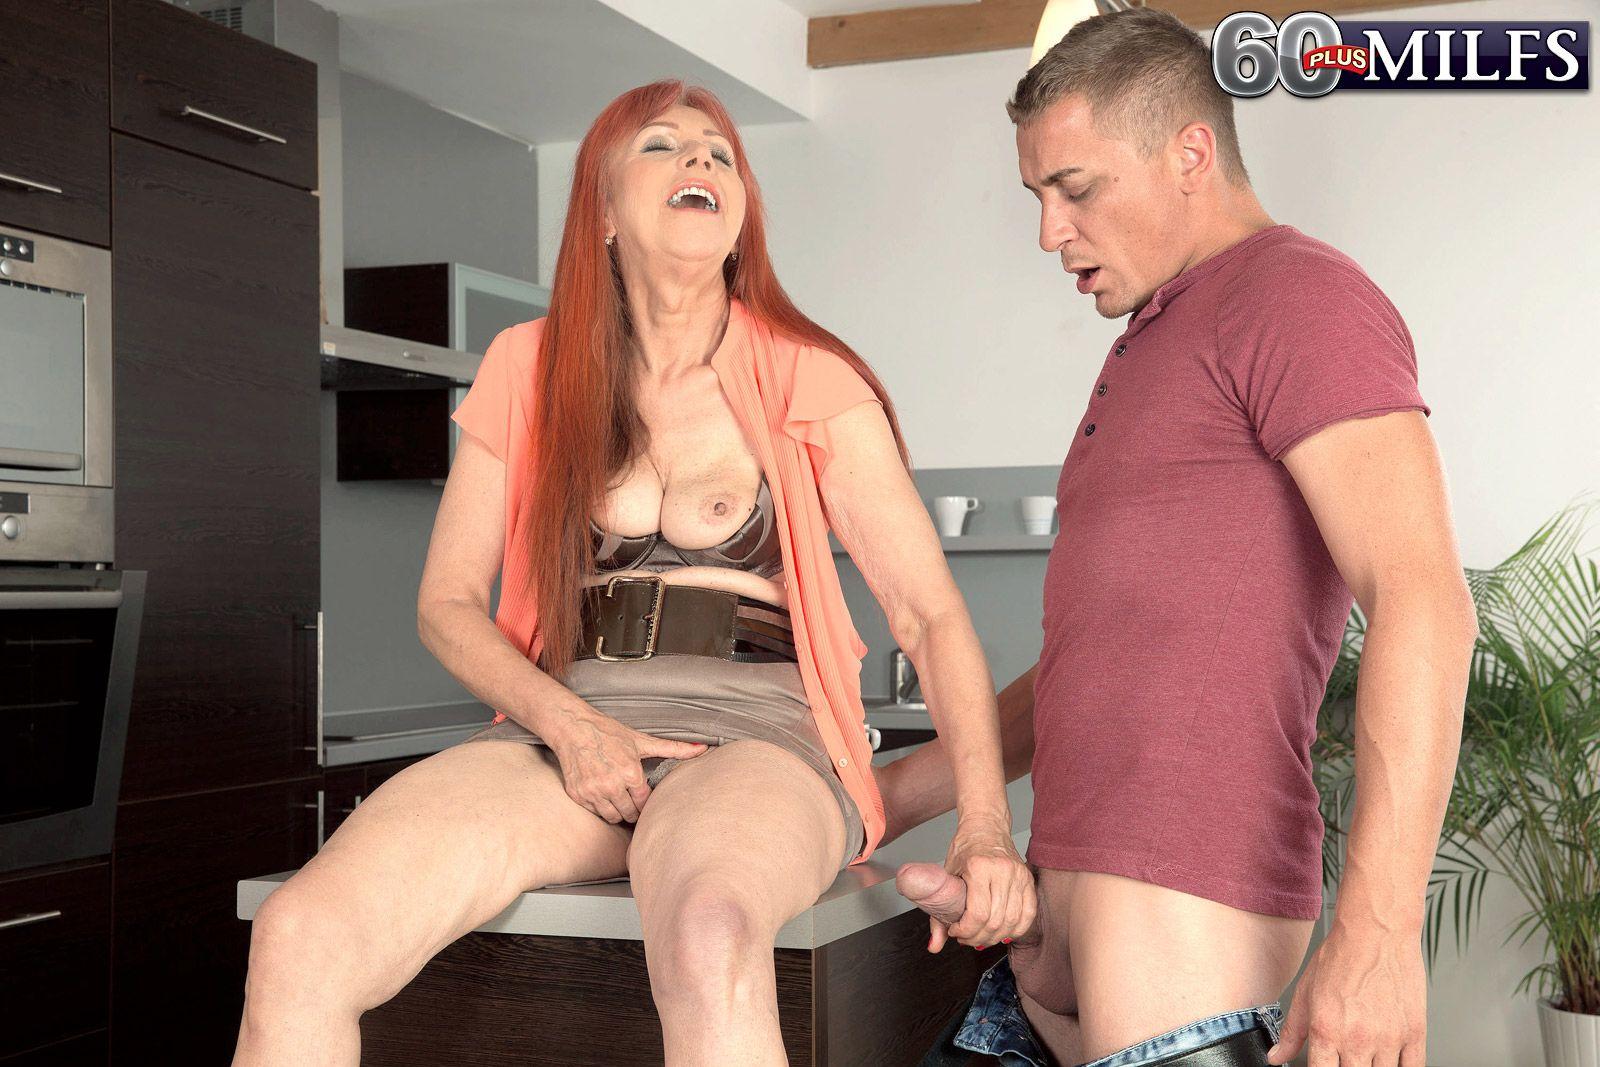 Busty redhead over 60 porn model Charlotta having nice granny tits fondled